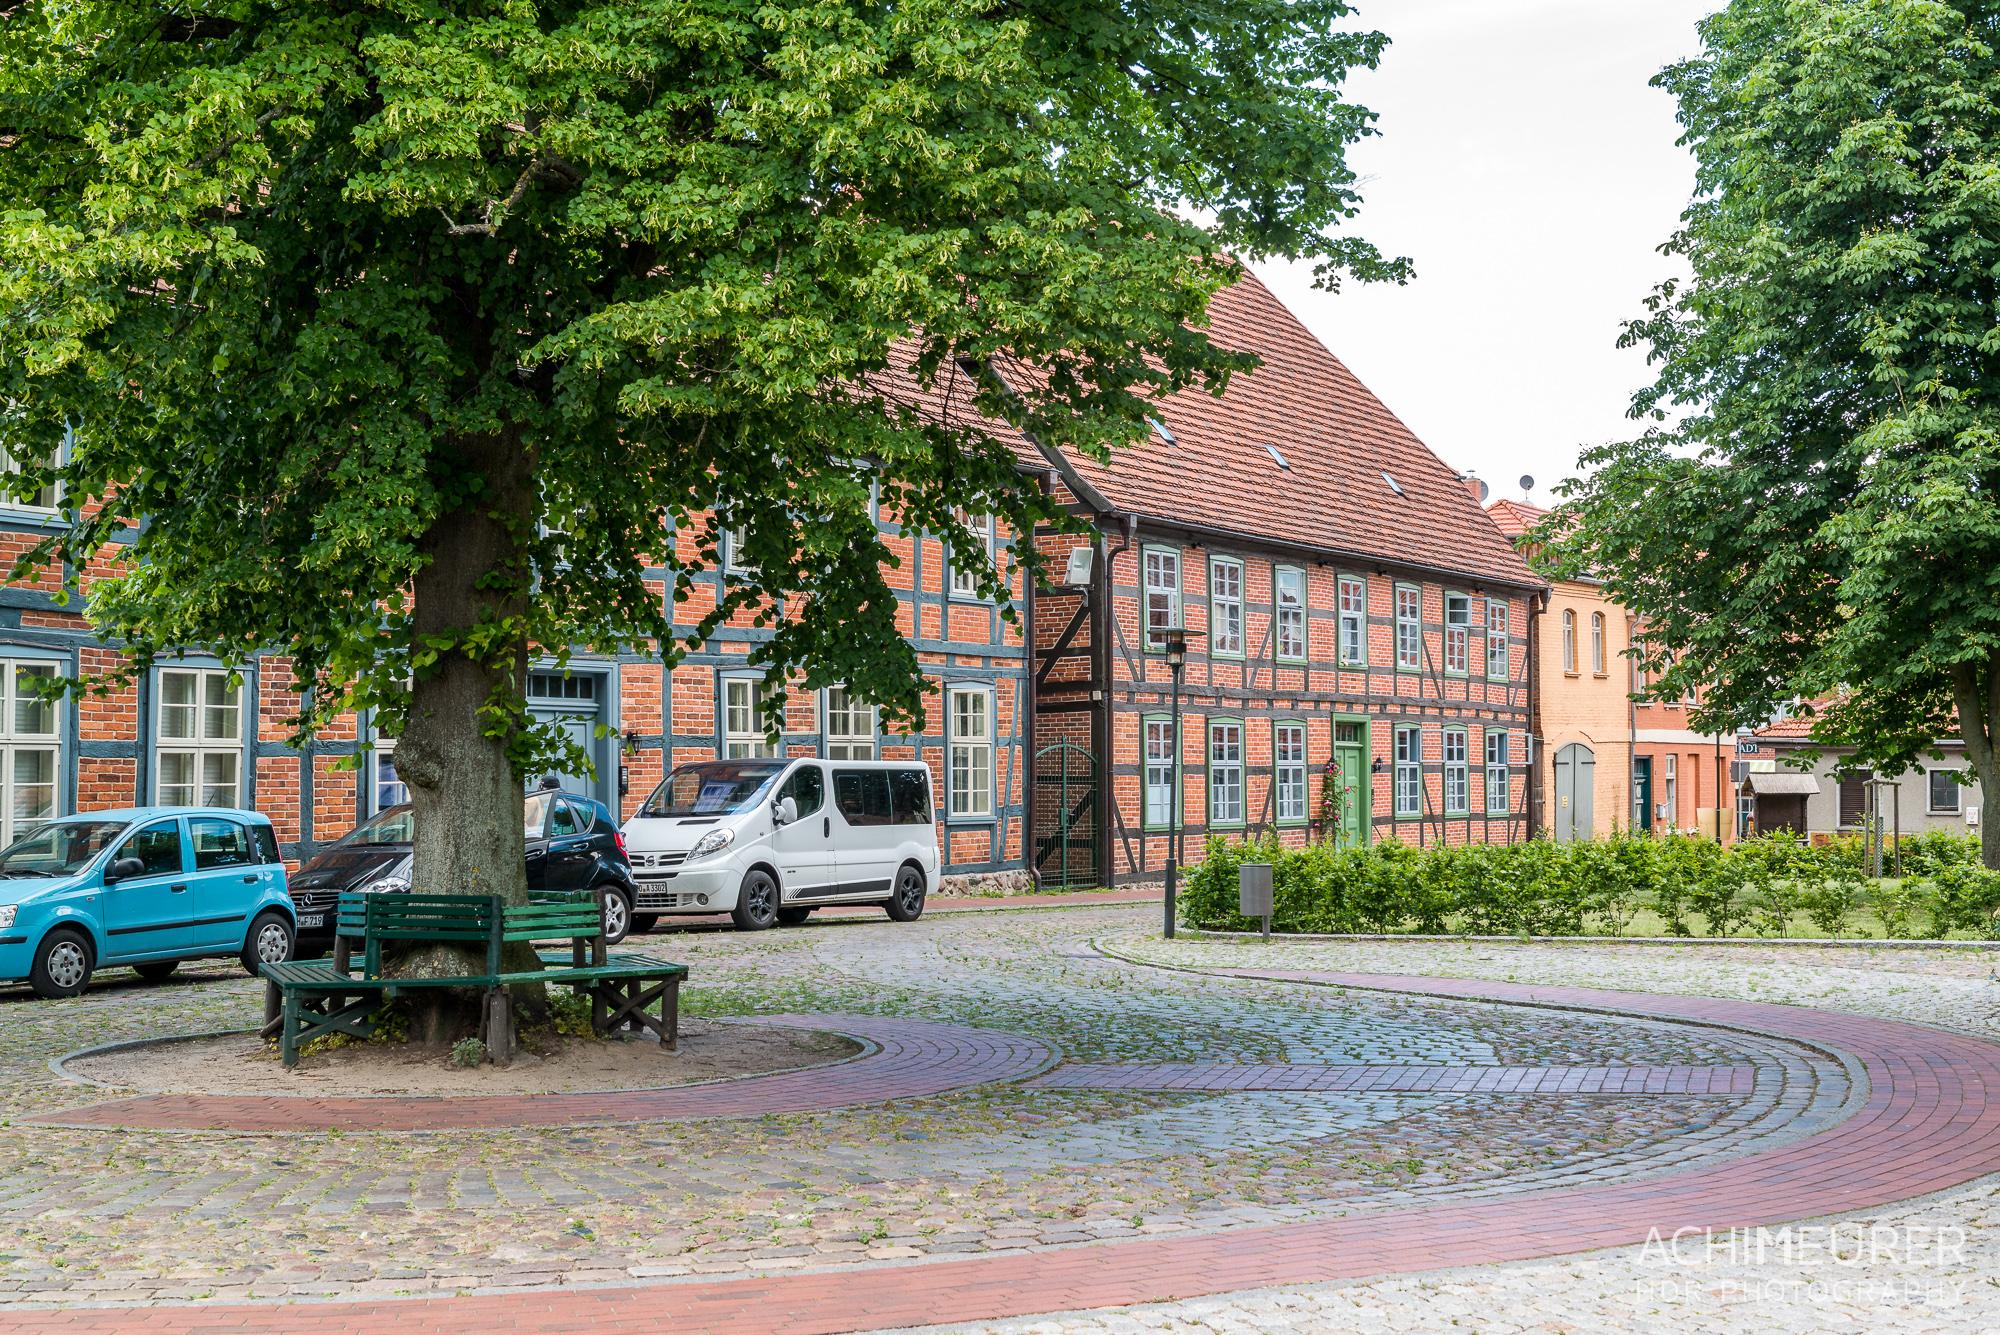 Hausboot-Kuhnle-Mueritz-Mecklenburg-Vorpommern-See_3833